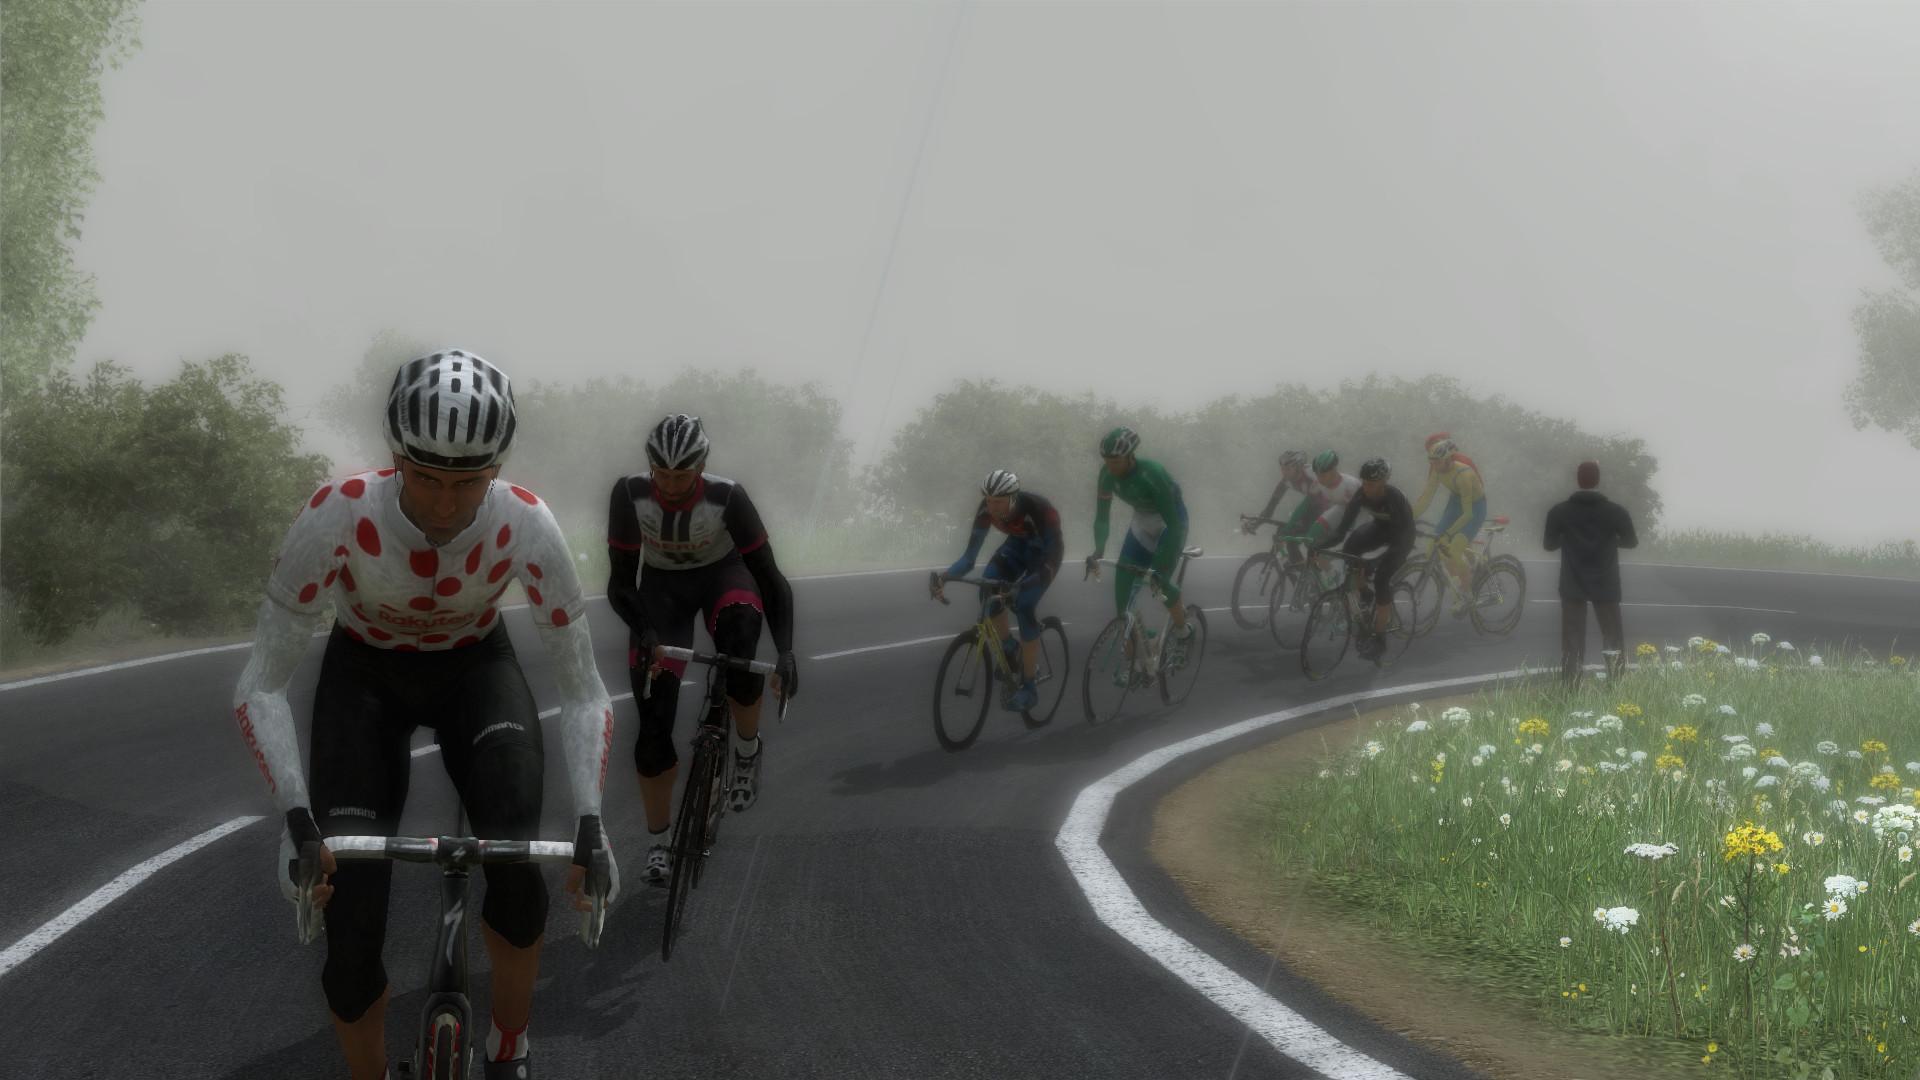 pcmdaily.com/images/mg/2019/Races/PTHC/Pologne/E5/11.jpg